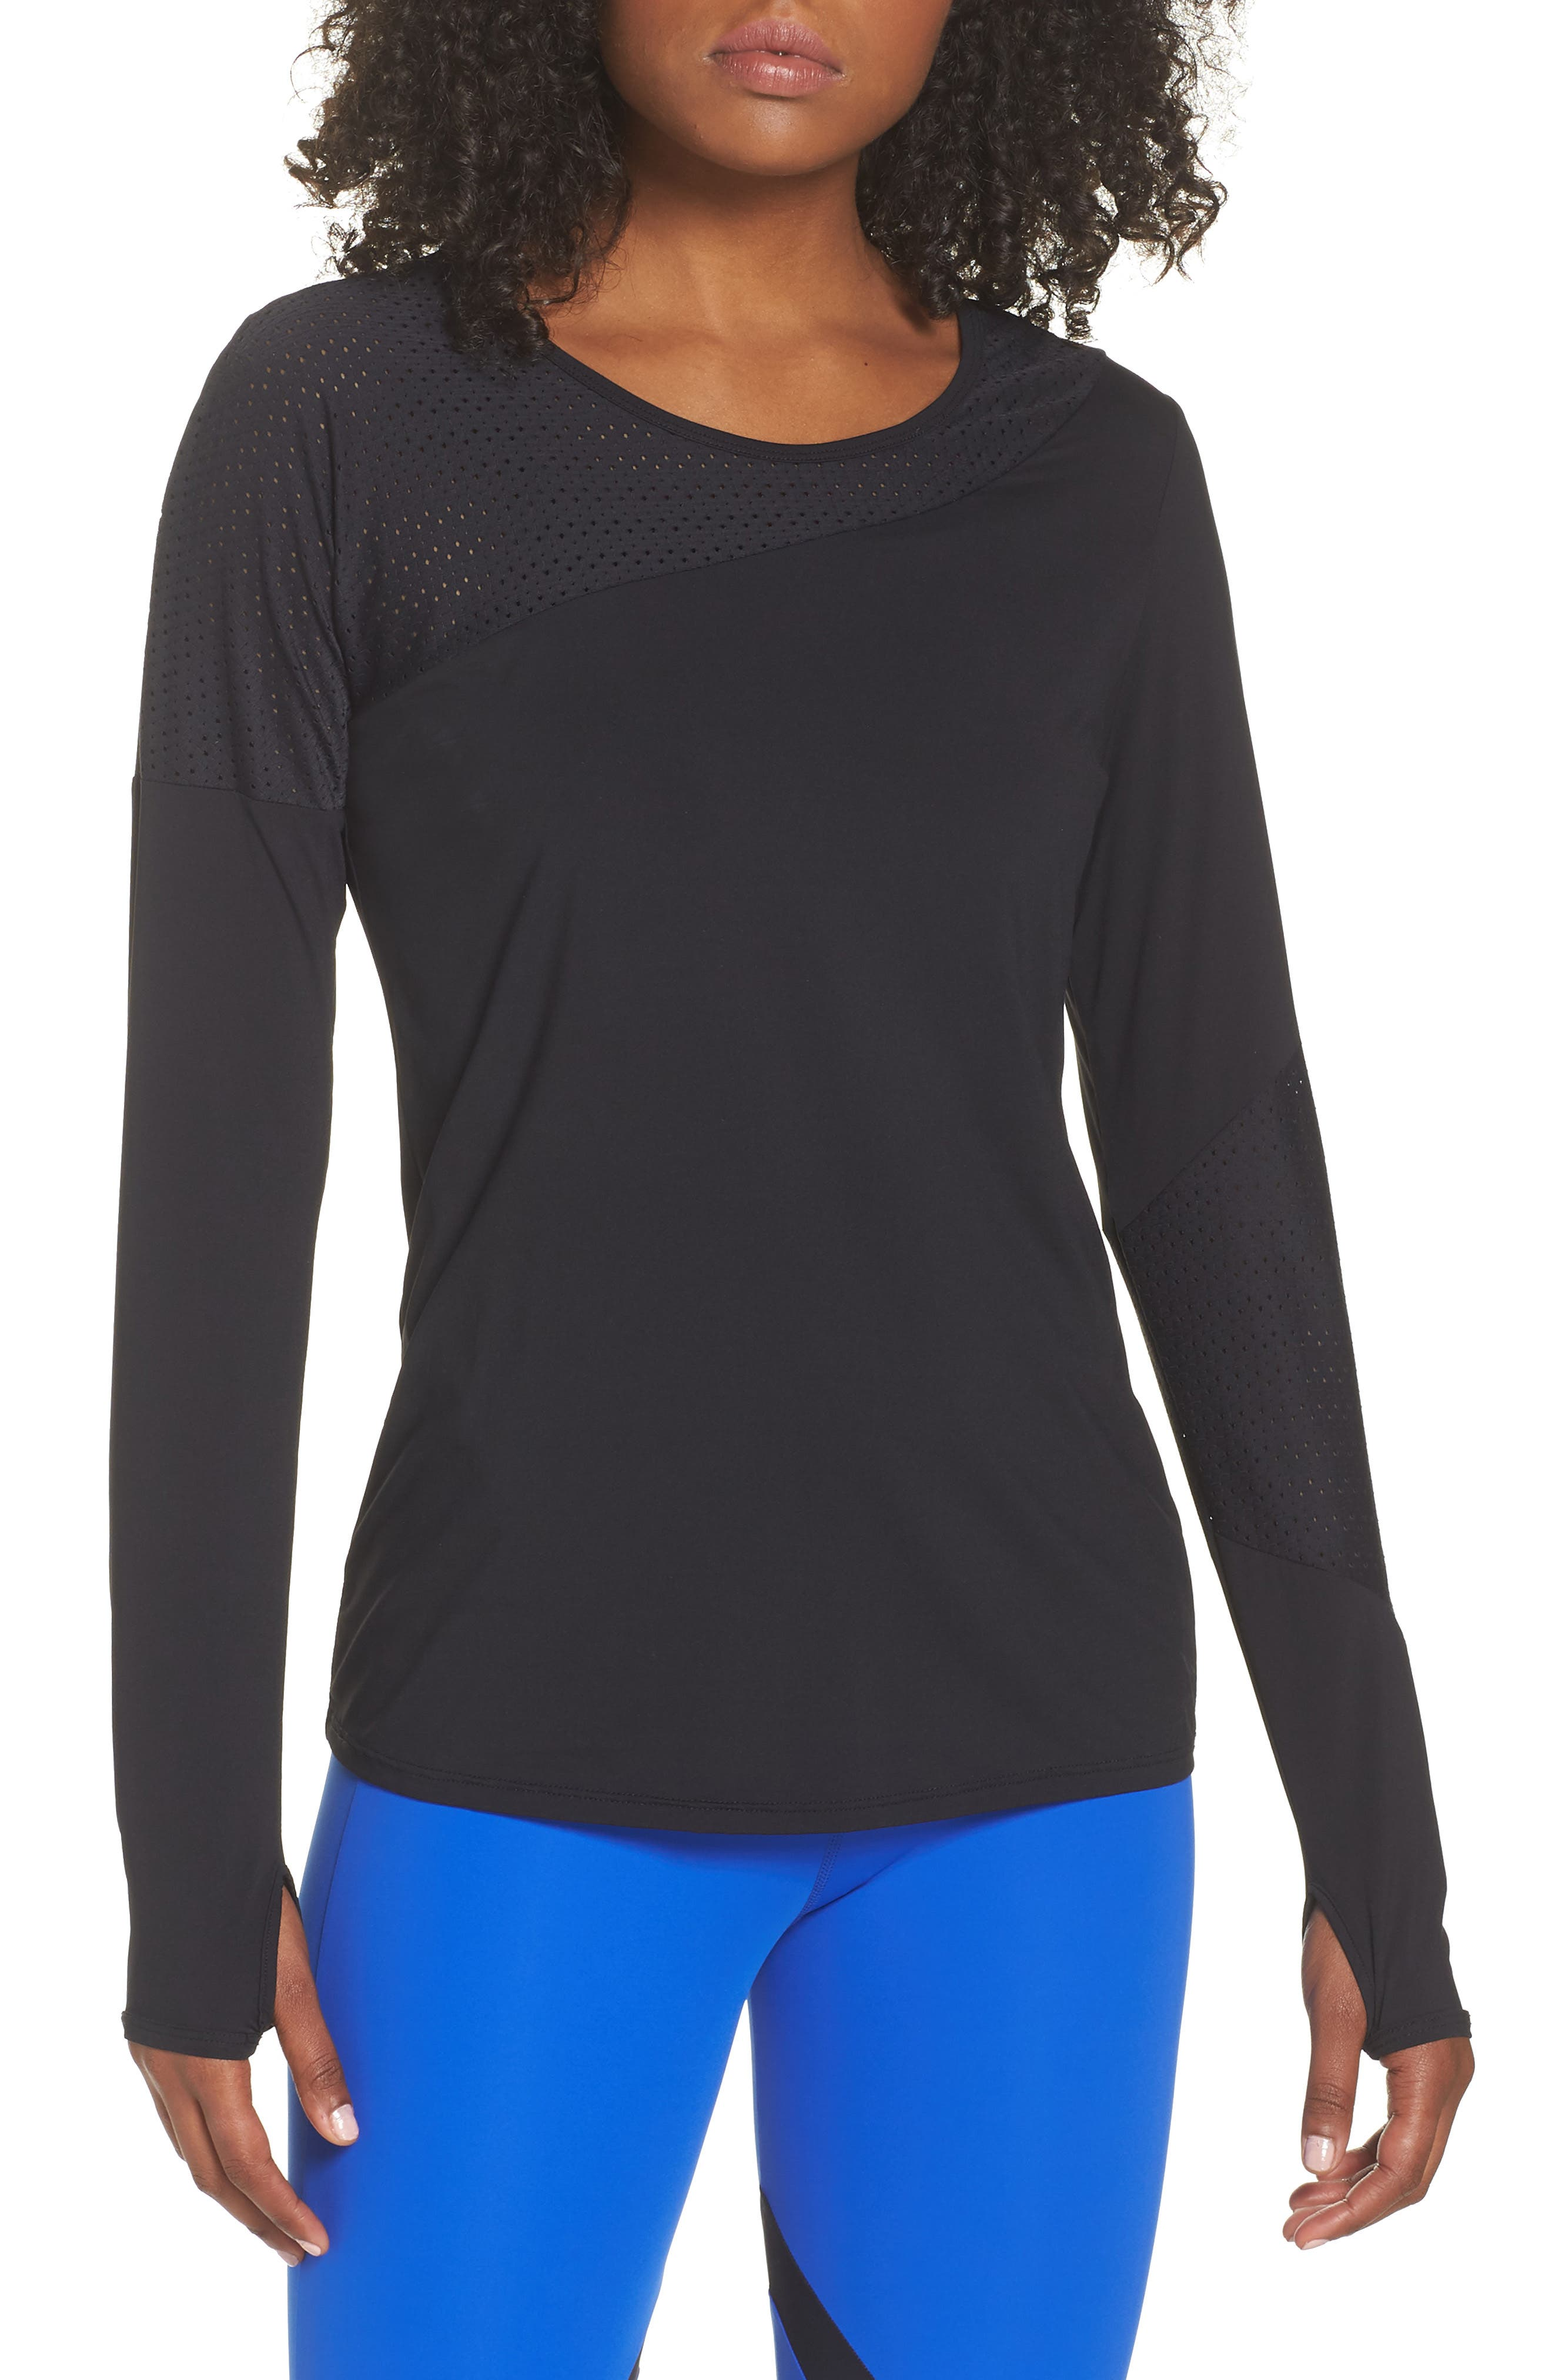 BoomBoom Athletica Easy Tunic,                         Main,                         color, Black